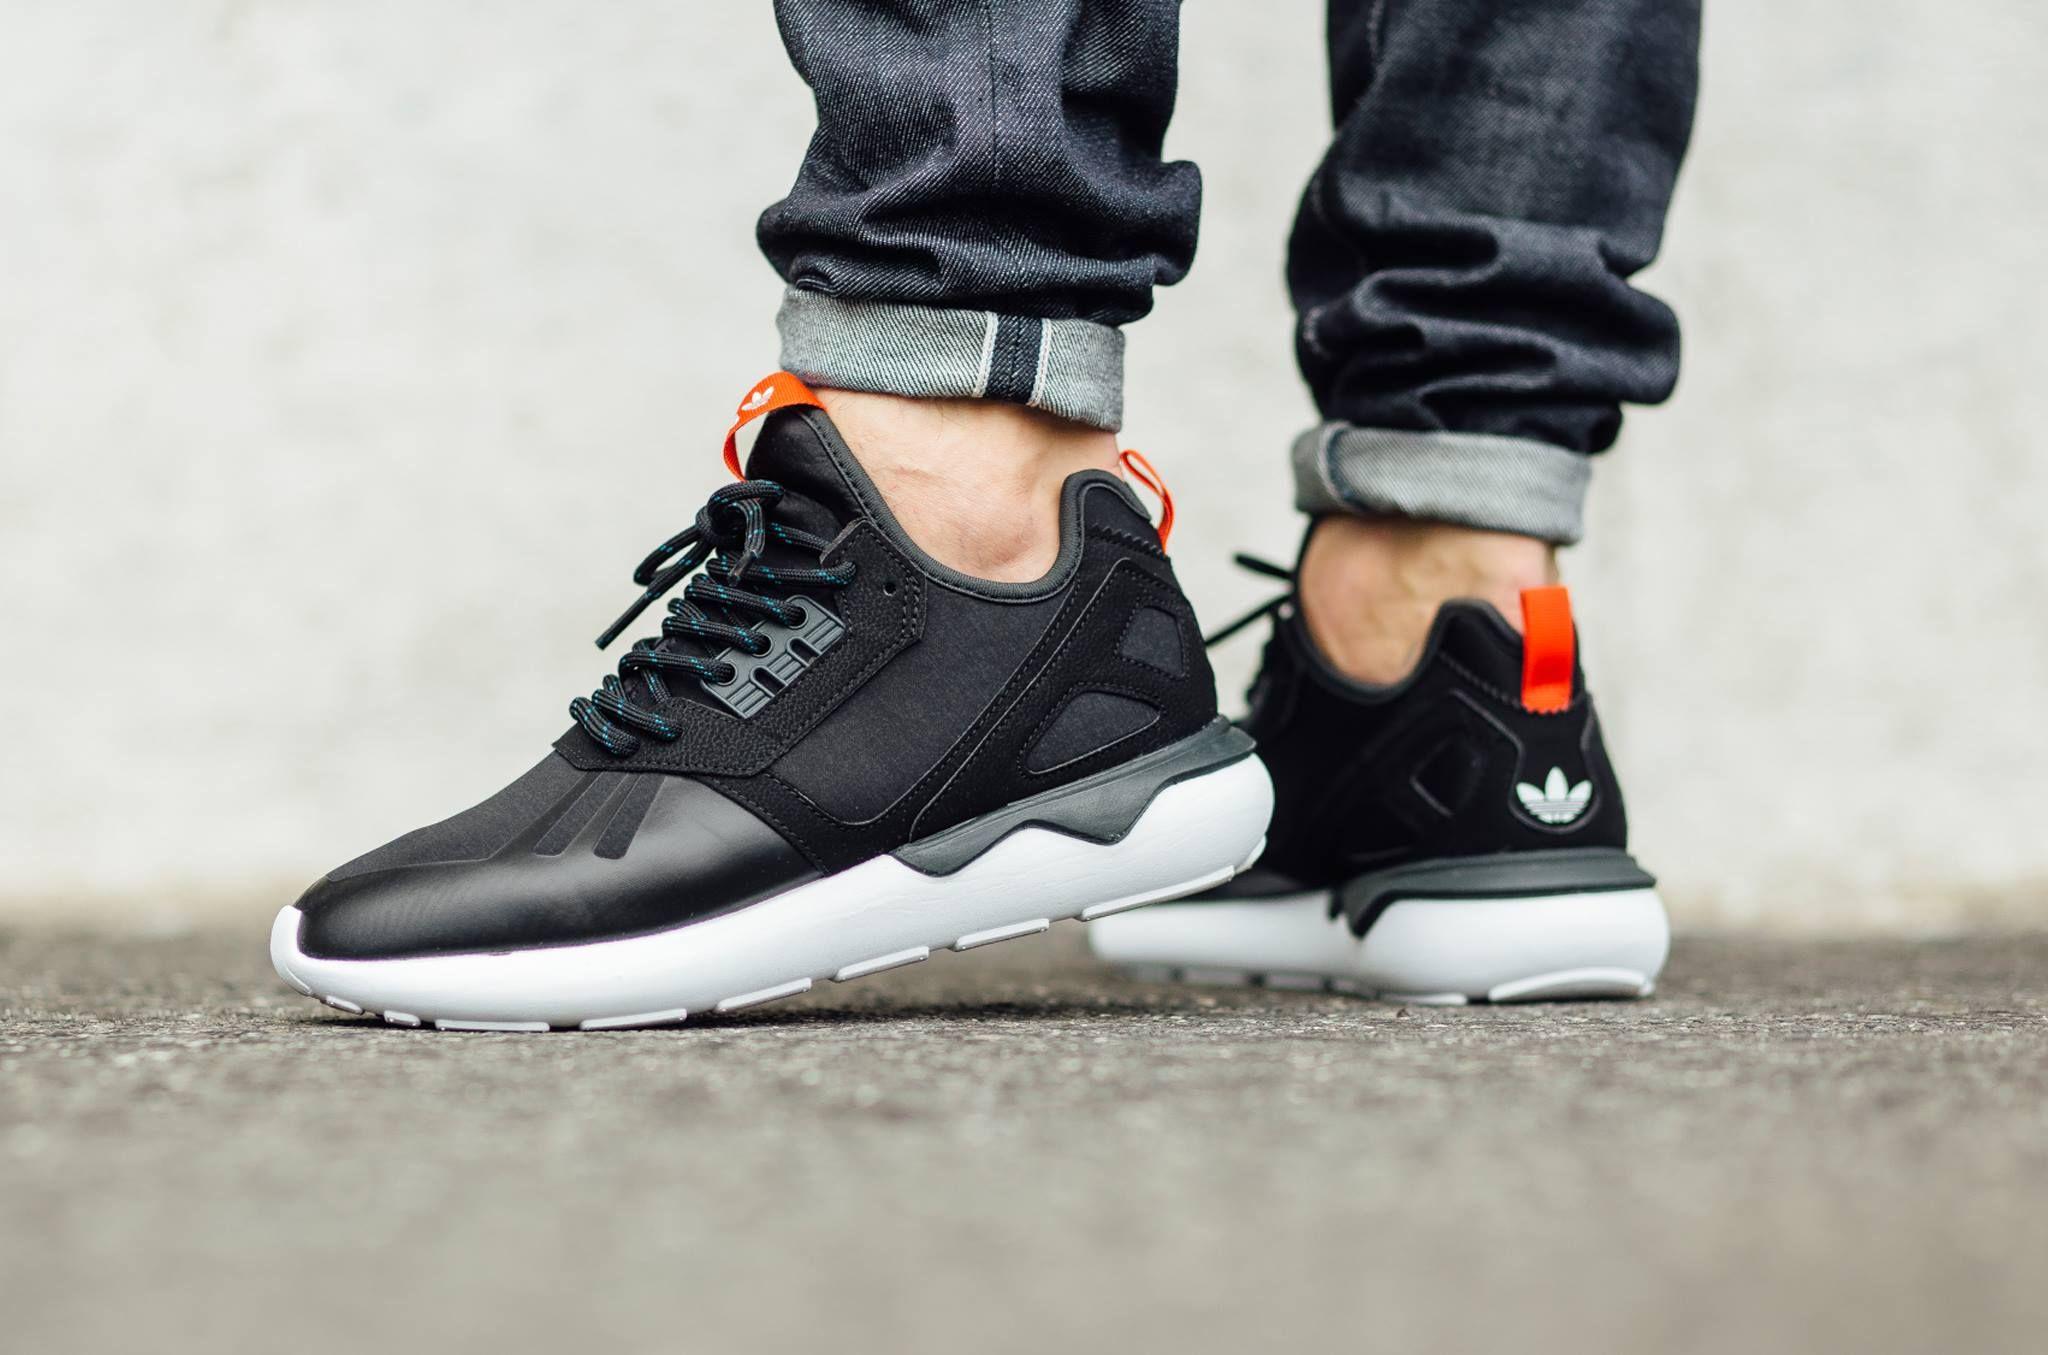 Adidas Tubular Runner Weave Tomato Kicks Links Adidas Tubular Runner Weave Tubular Runner Sneakers